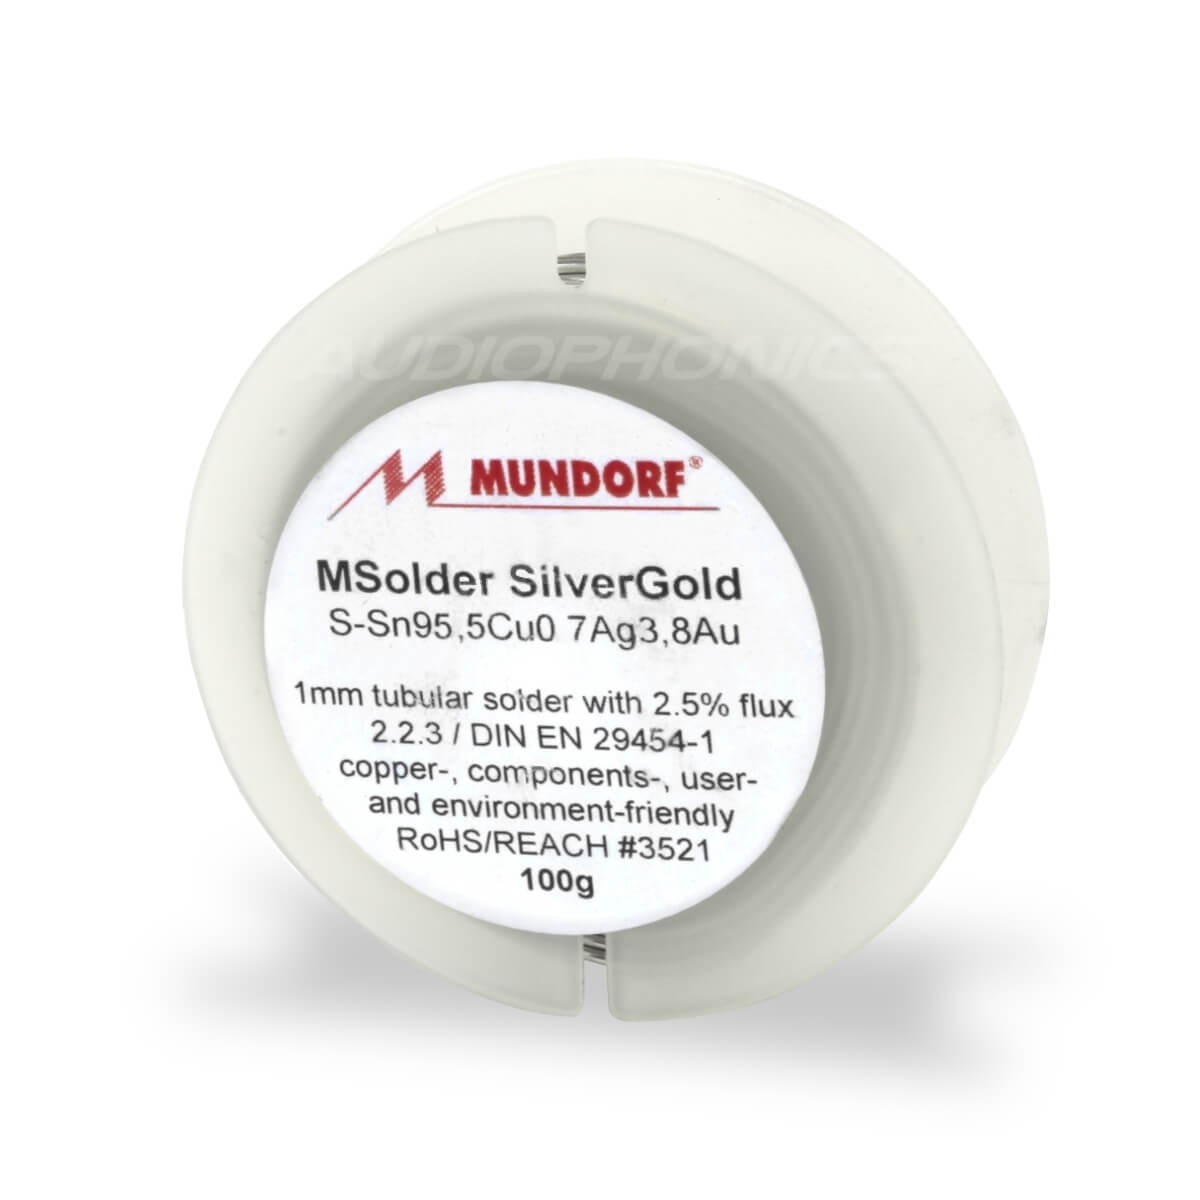 Soldering tin - Mundorf Silver-Gold 4%